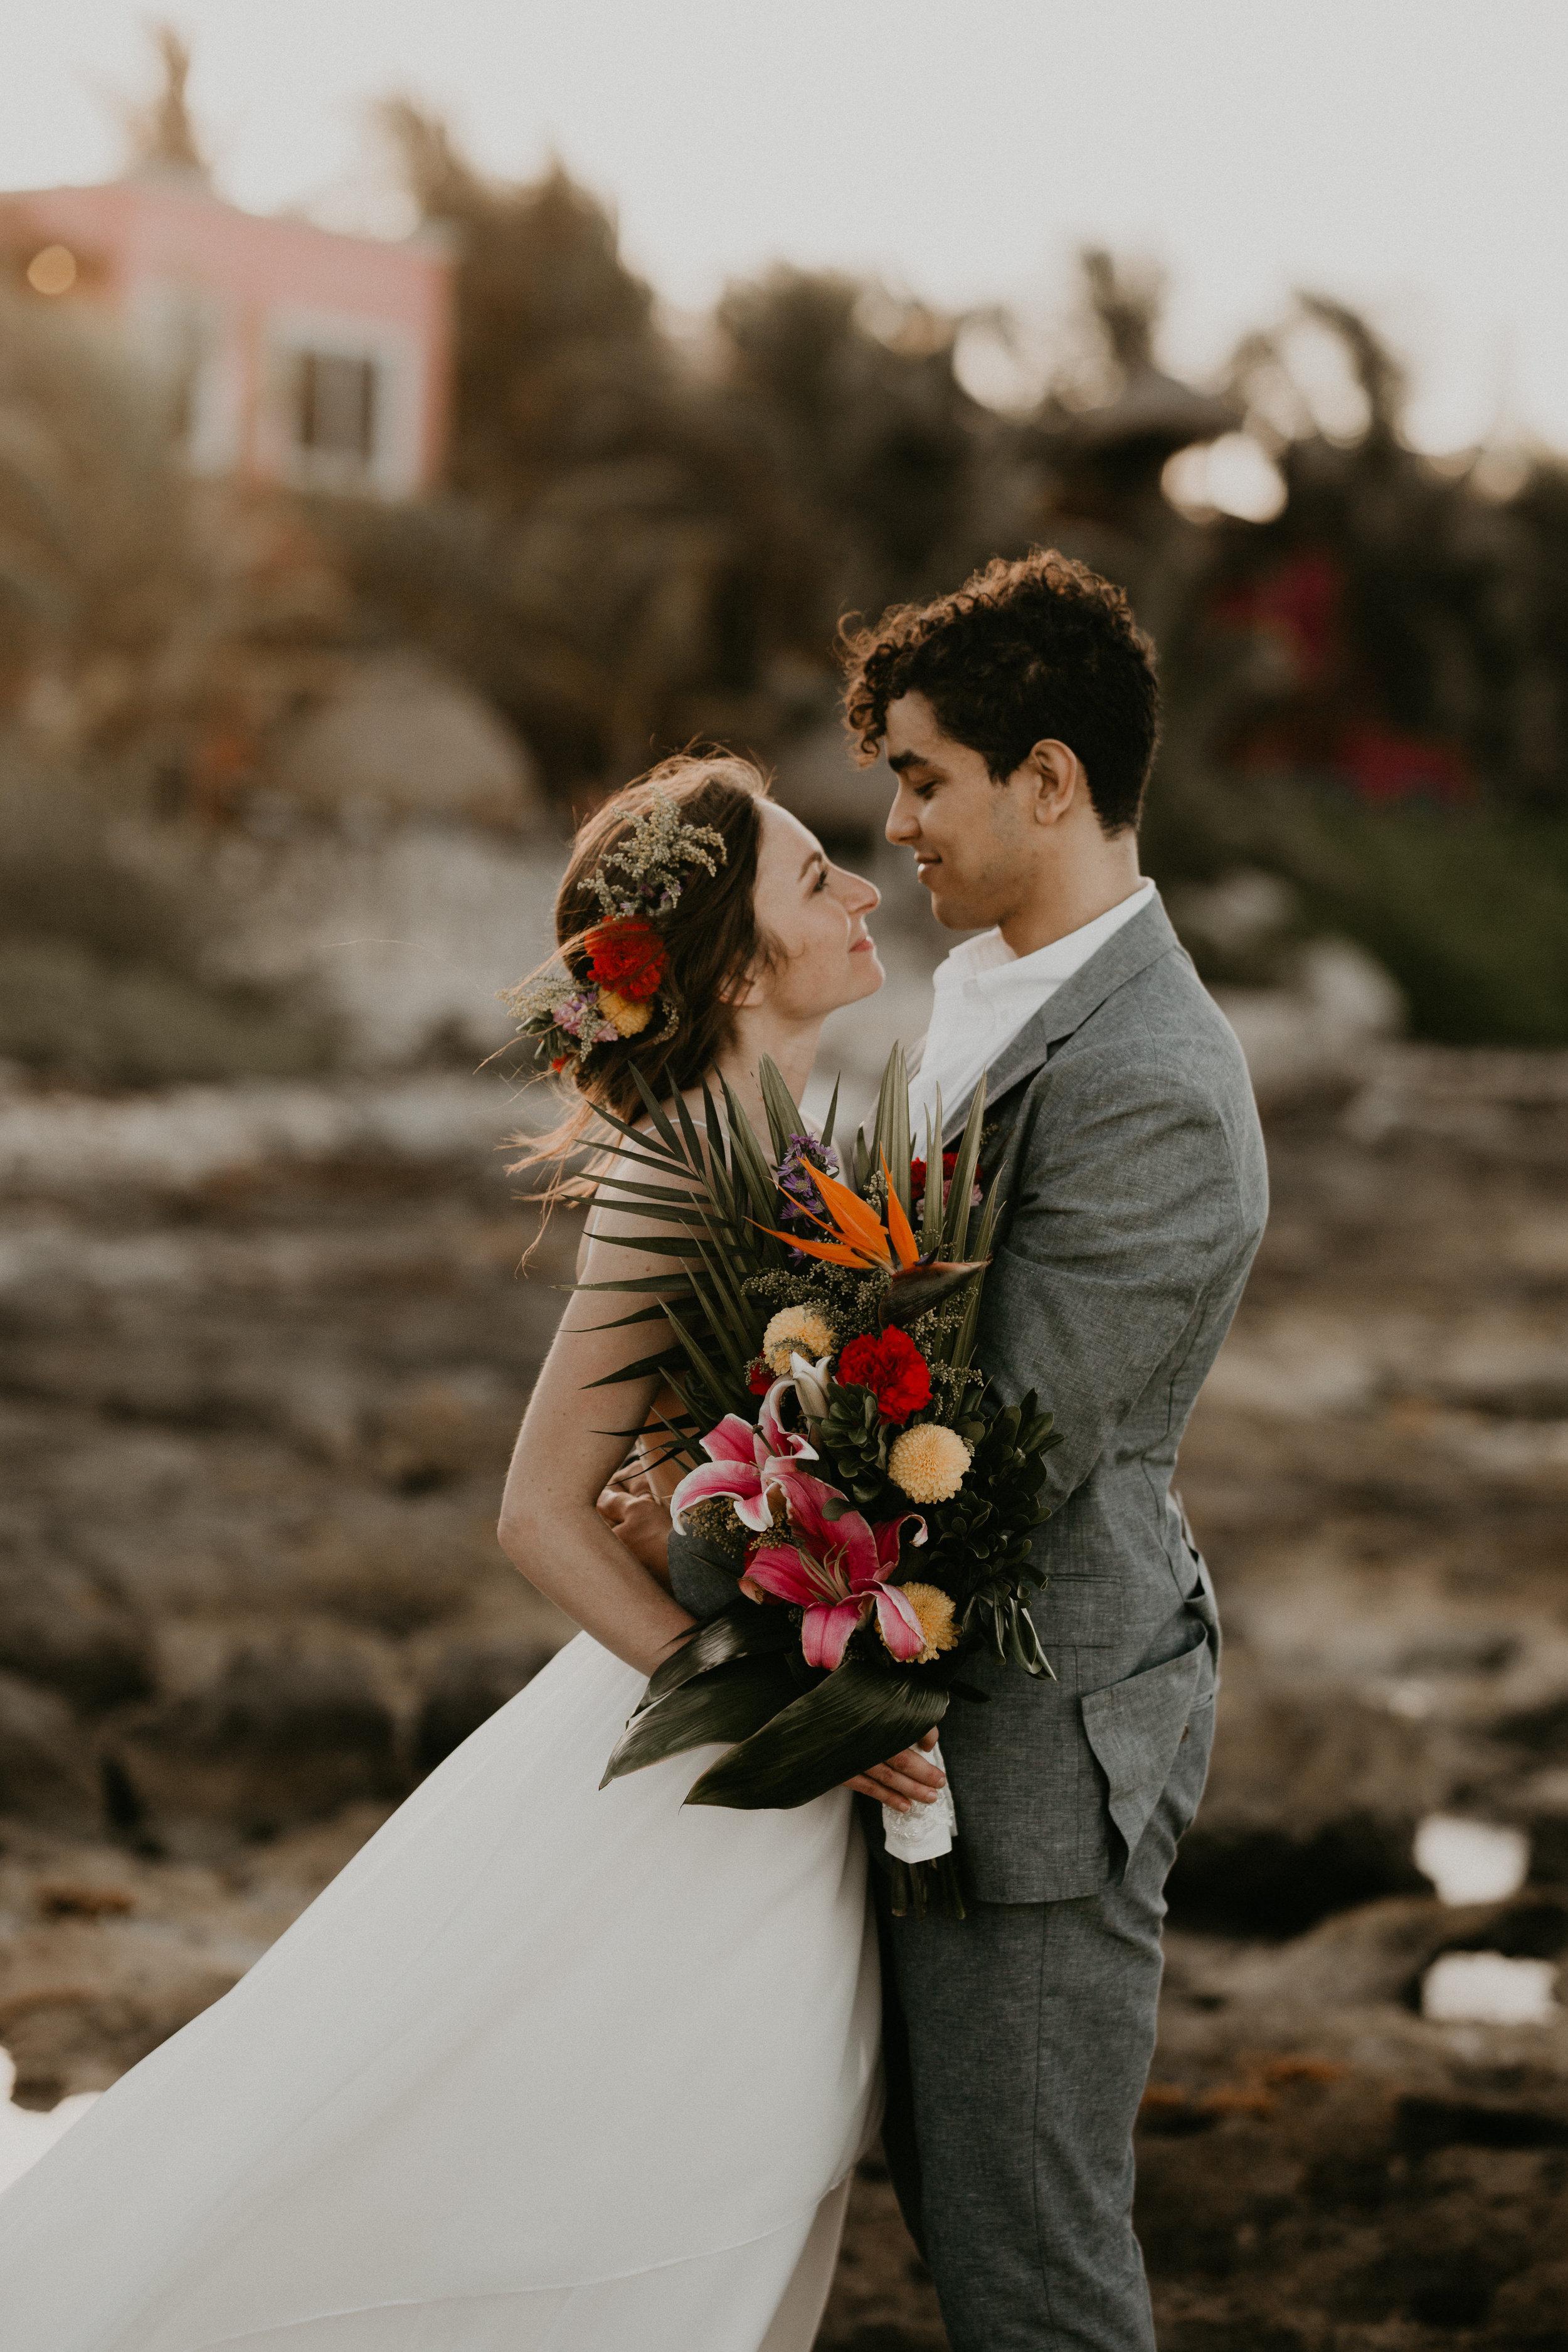 Nicole-Daacke-Photography-beachfront-akumal-destionation-wedding-tulum-mexico-elopement-photographer-destination-wedding-inspiration-sunset-champagne-pop-boho-bride-ocean-tropical-bohemian-tulum-wedding-photos-188.jpg